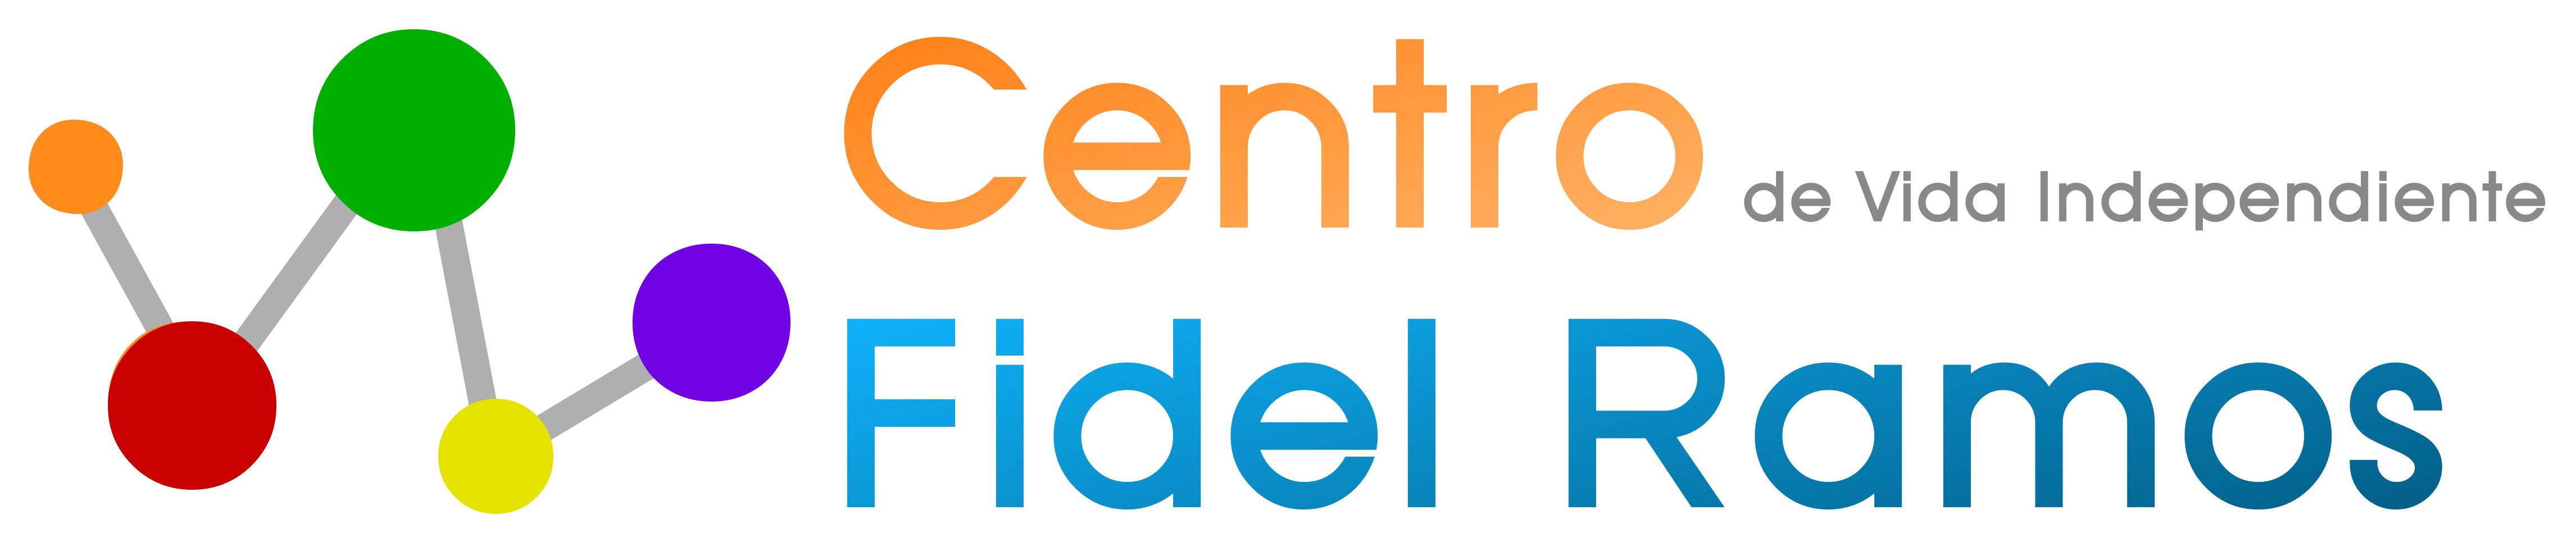 Centro Fidel Ramos